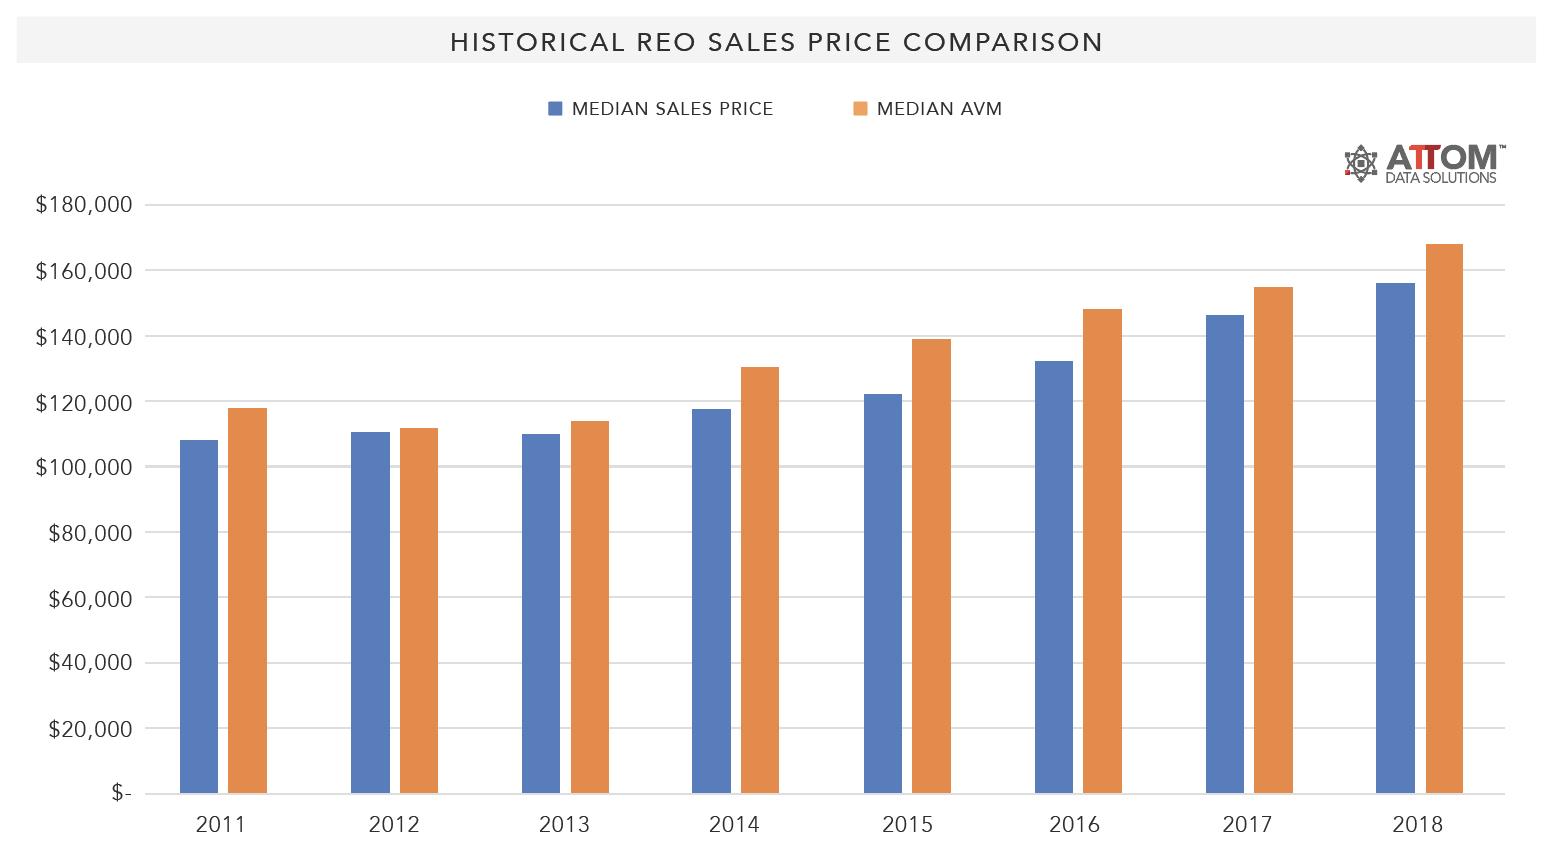 Historical_REO_Sales_Price_Comparison